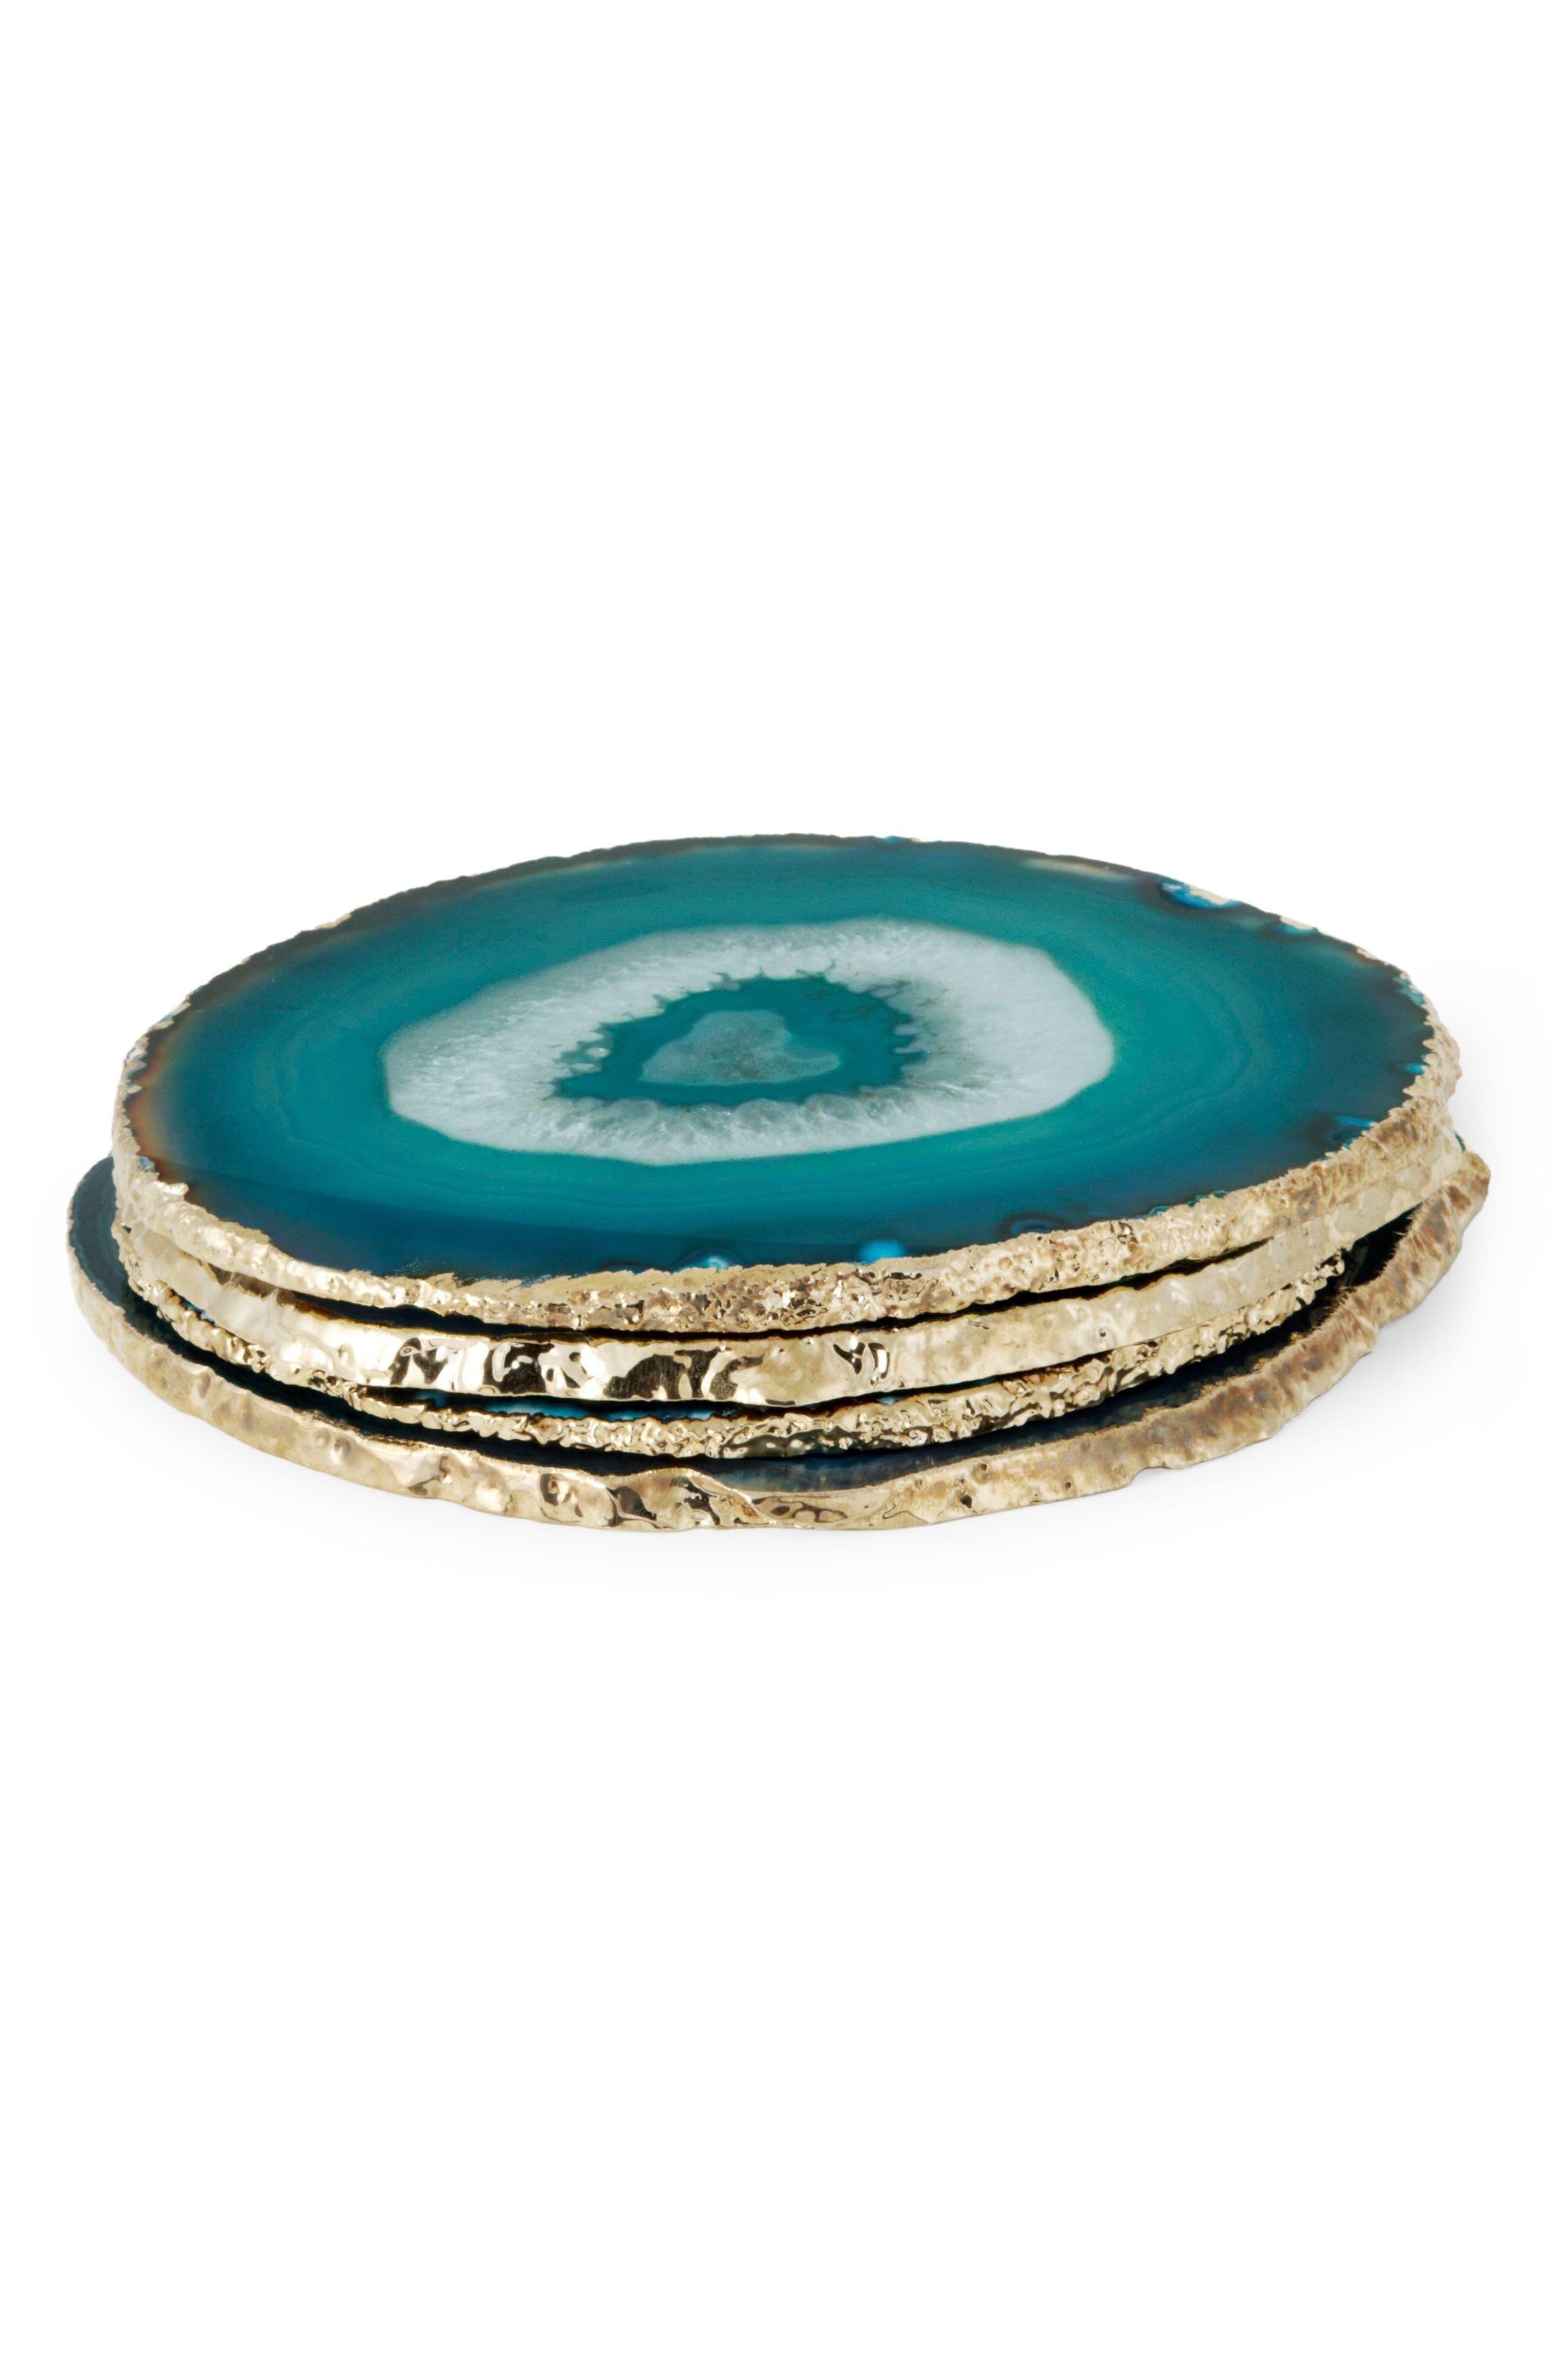 Set of 4 Agate Coasters,                         Main,                         color, BLUE